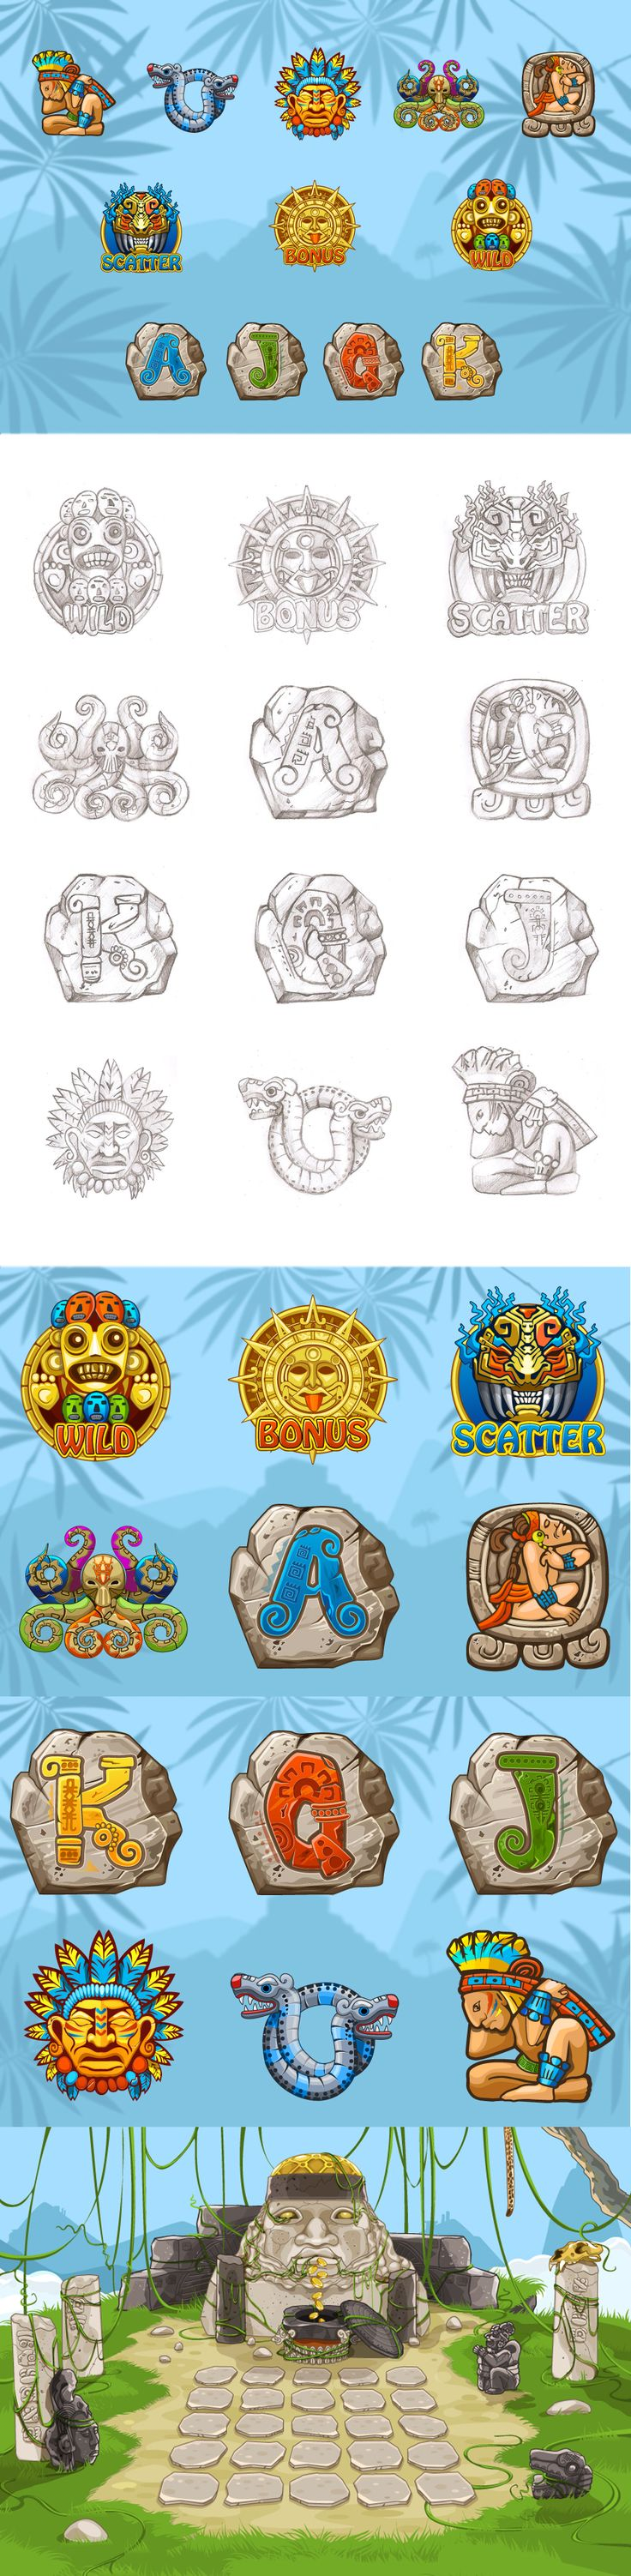 "Development of graphic design for the game slot-machine ""Aztec"""